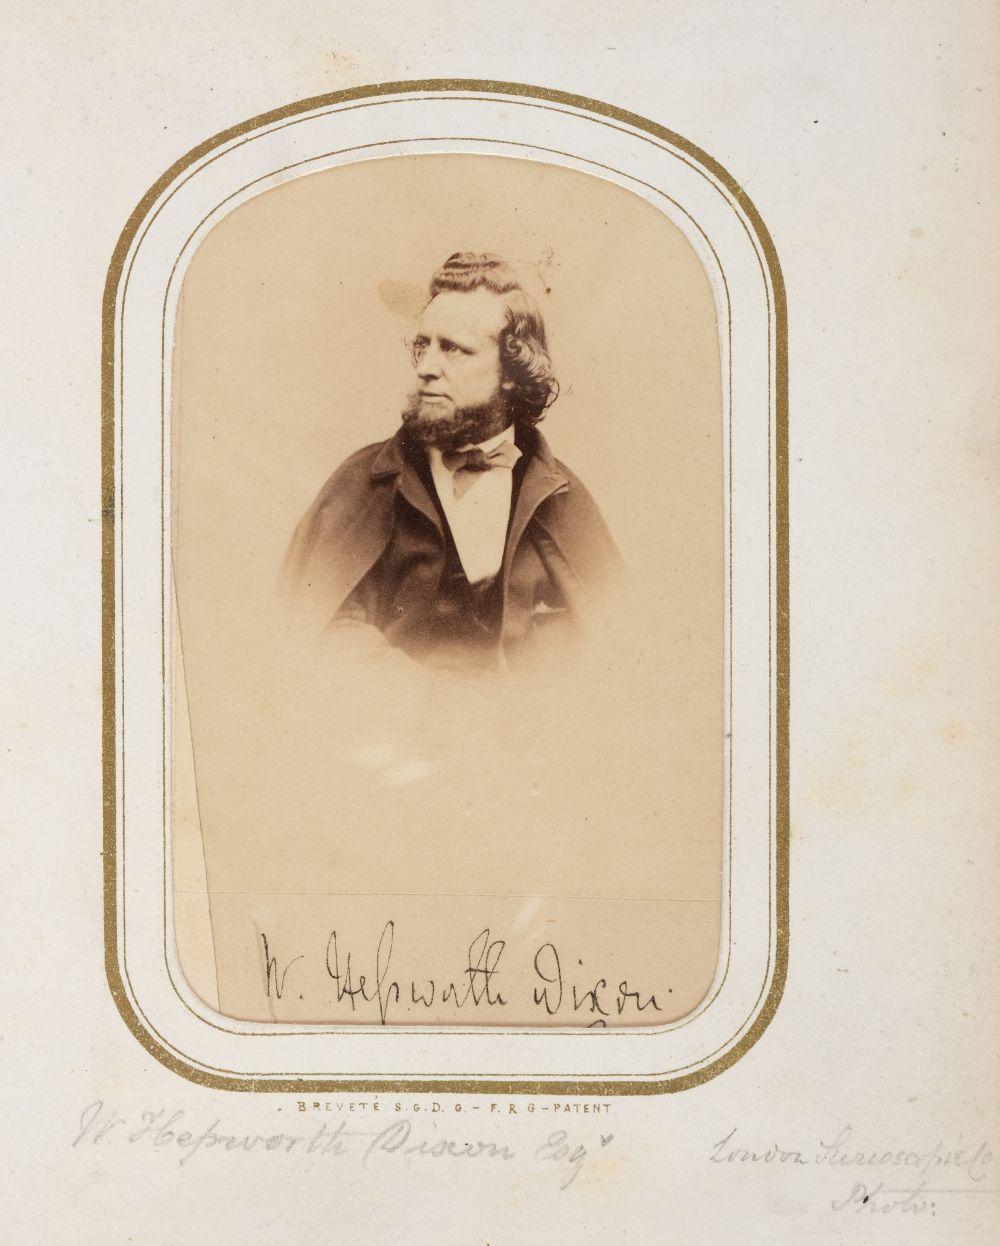 * Cartes de visite. A cartes-de-visite album, c. 1860s/1880s - Image 10 of 18